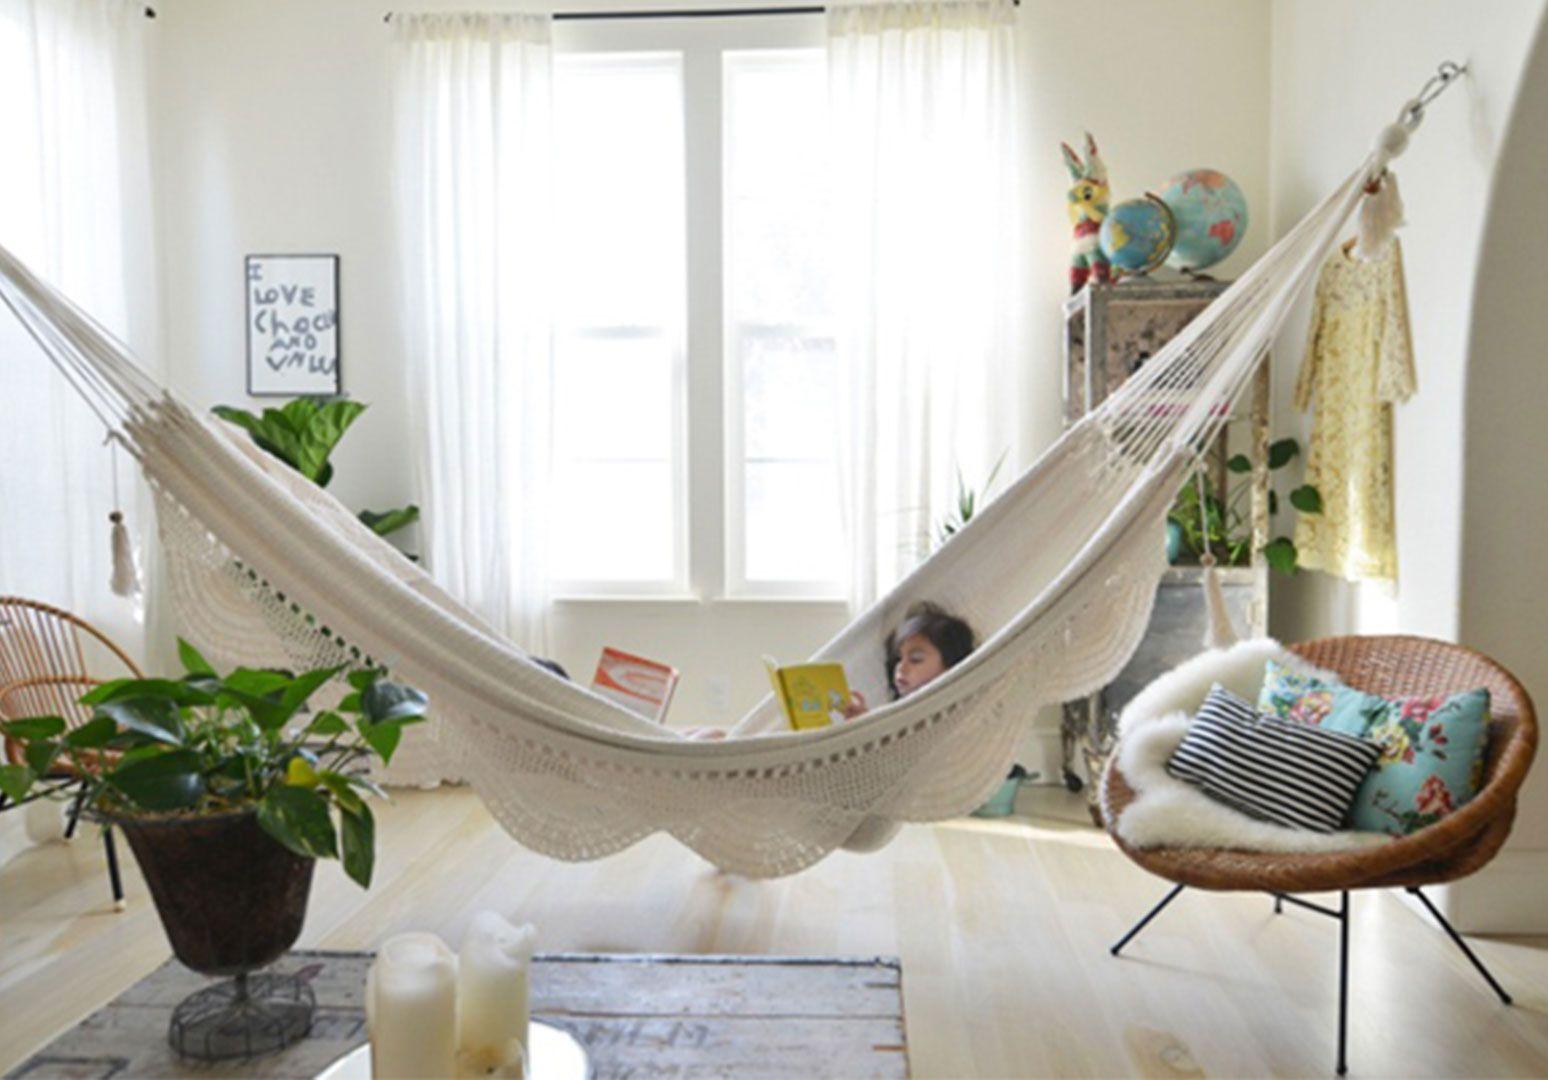 Floating Indoor Hammock Bed 131 Floating Indoor Hammock Bed Ideas Custom Living Room Hammock Design Inspiration